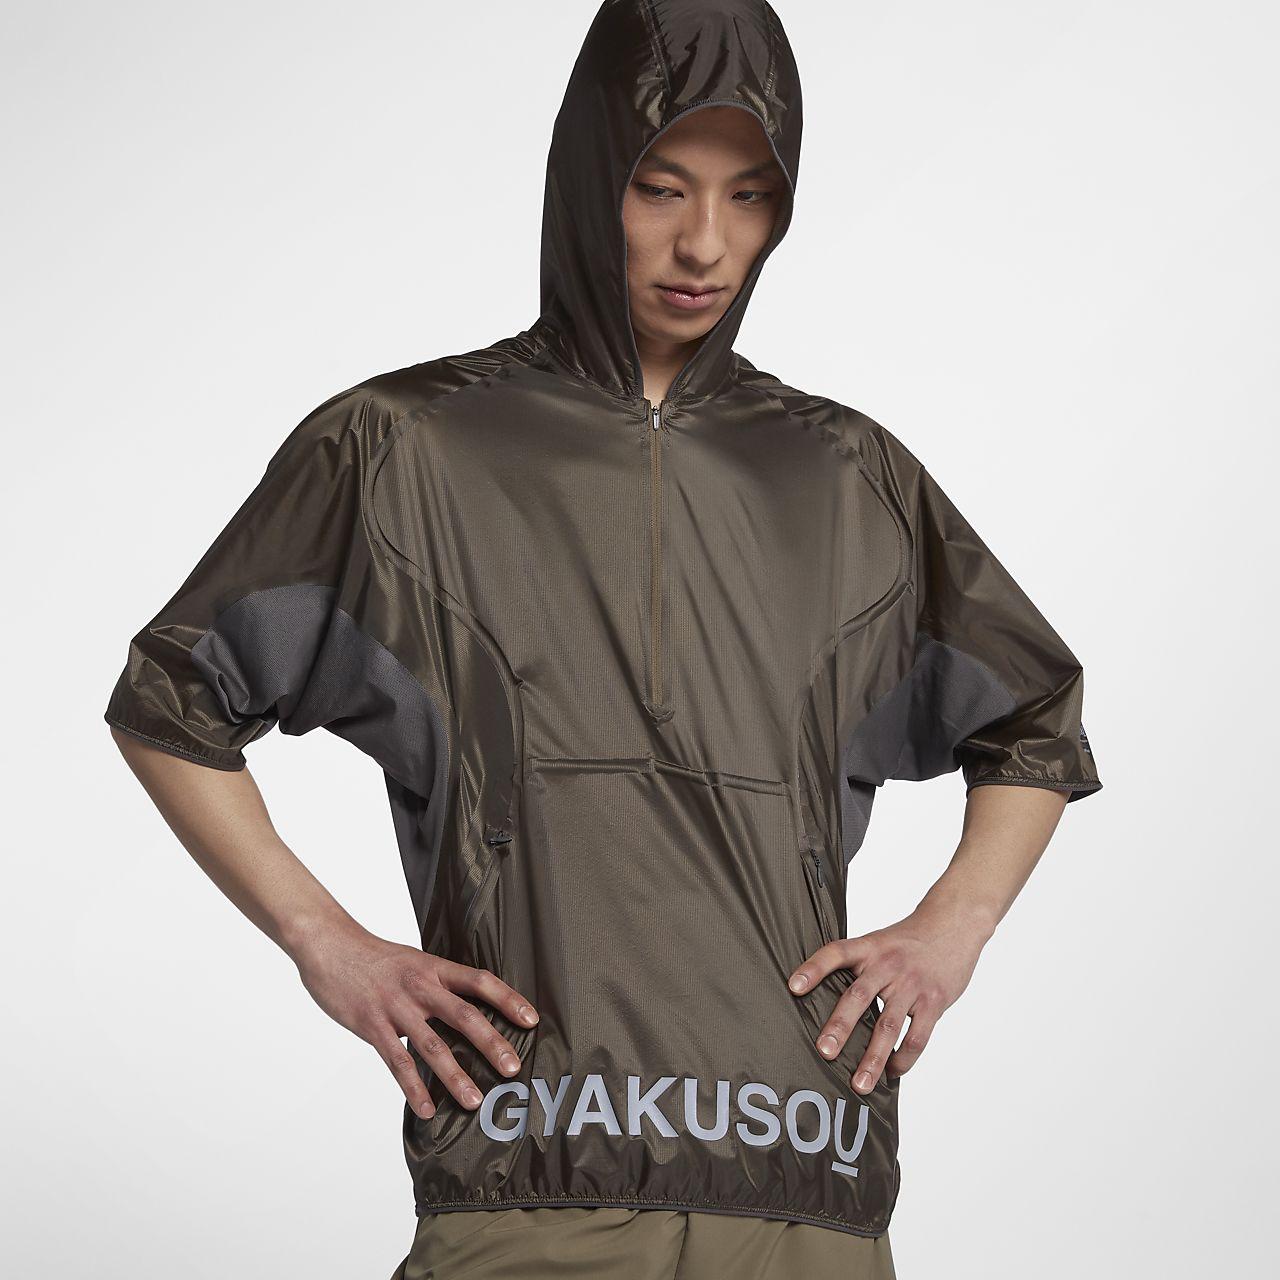 0652fcd41cedb NikeLab Gyakusou Men's Short-Sleeve Jacket. Nike.com SG